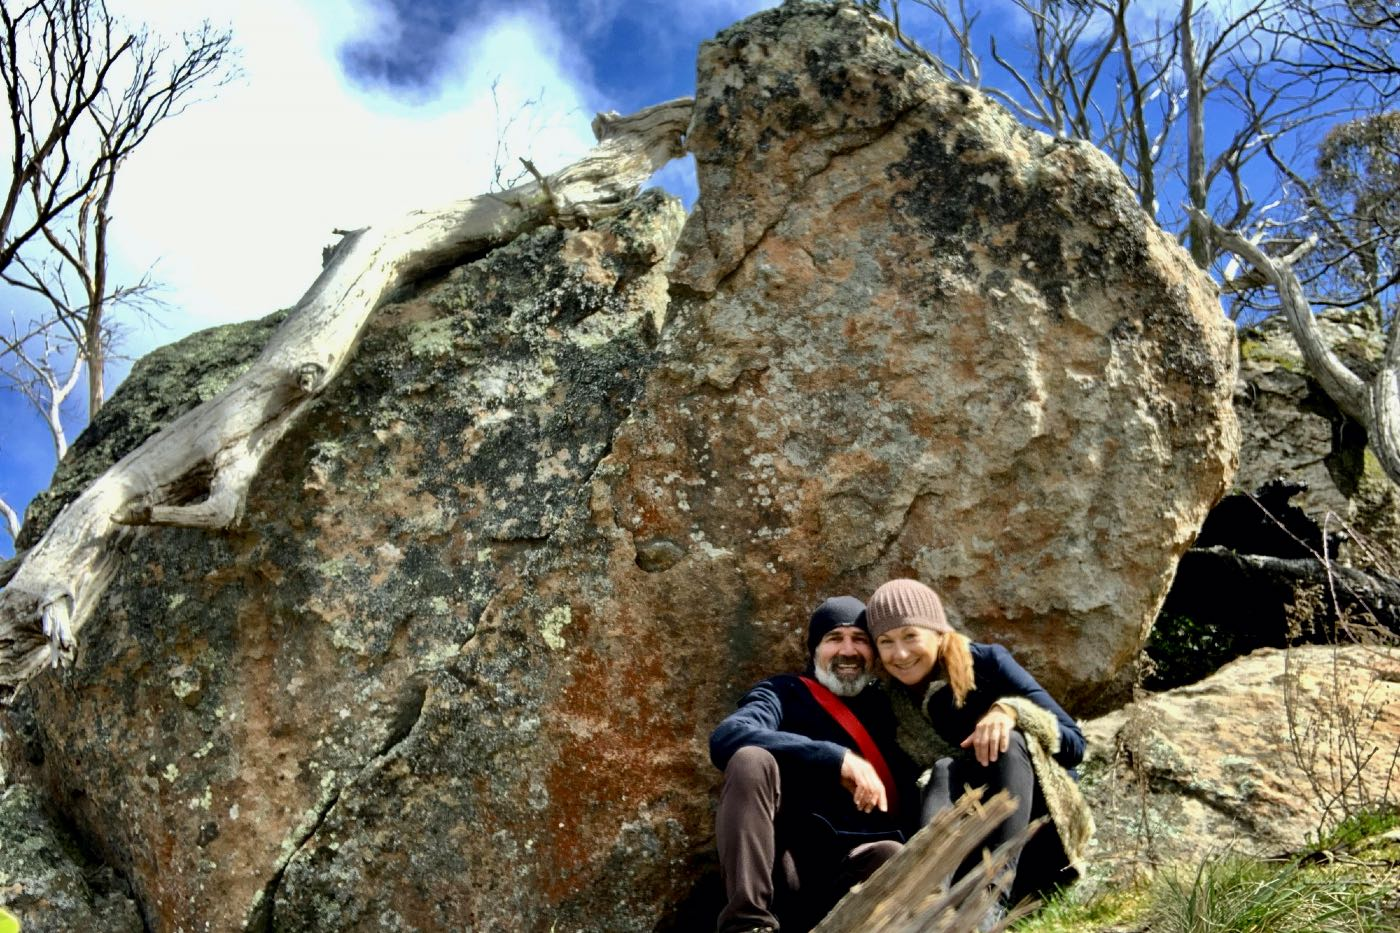 Storitell in Orange NSW Australia Mount Canobolas